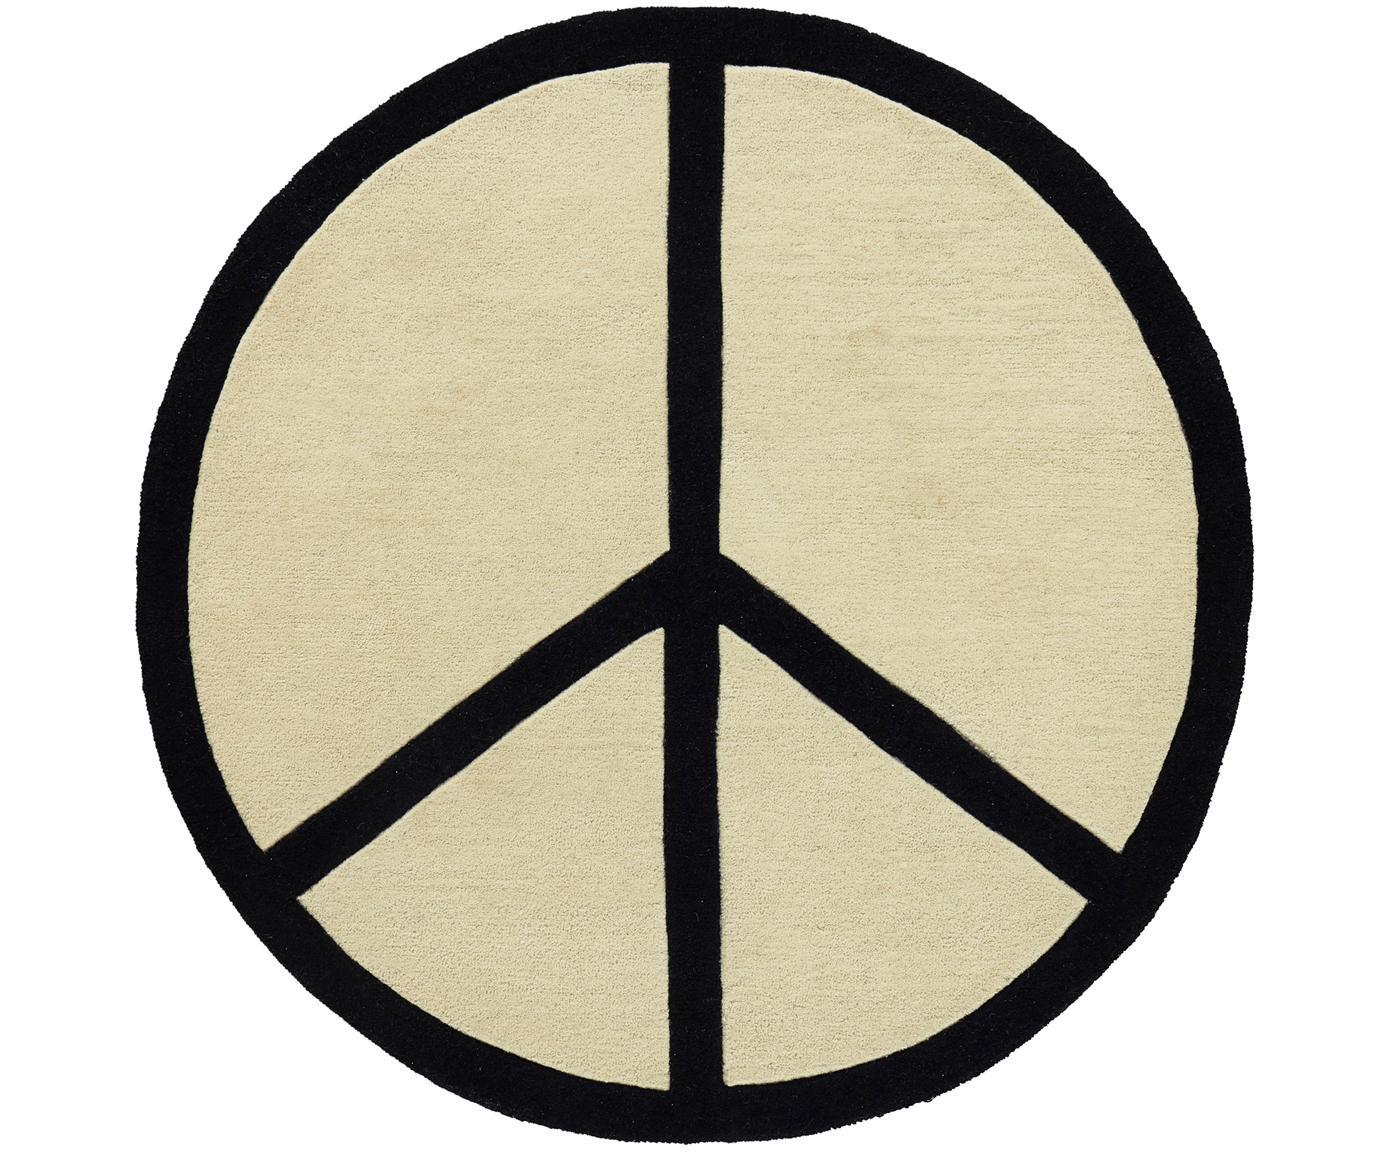 Rond handgetuft vloerkleed Peace Out, Wol, Crèmekleurig, zwart, Ø 120 cm